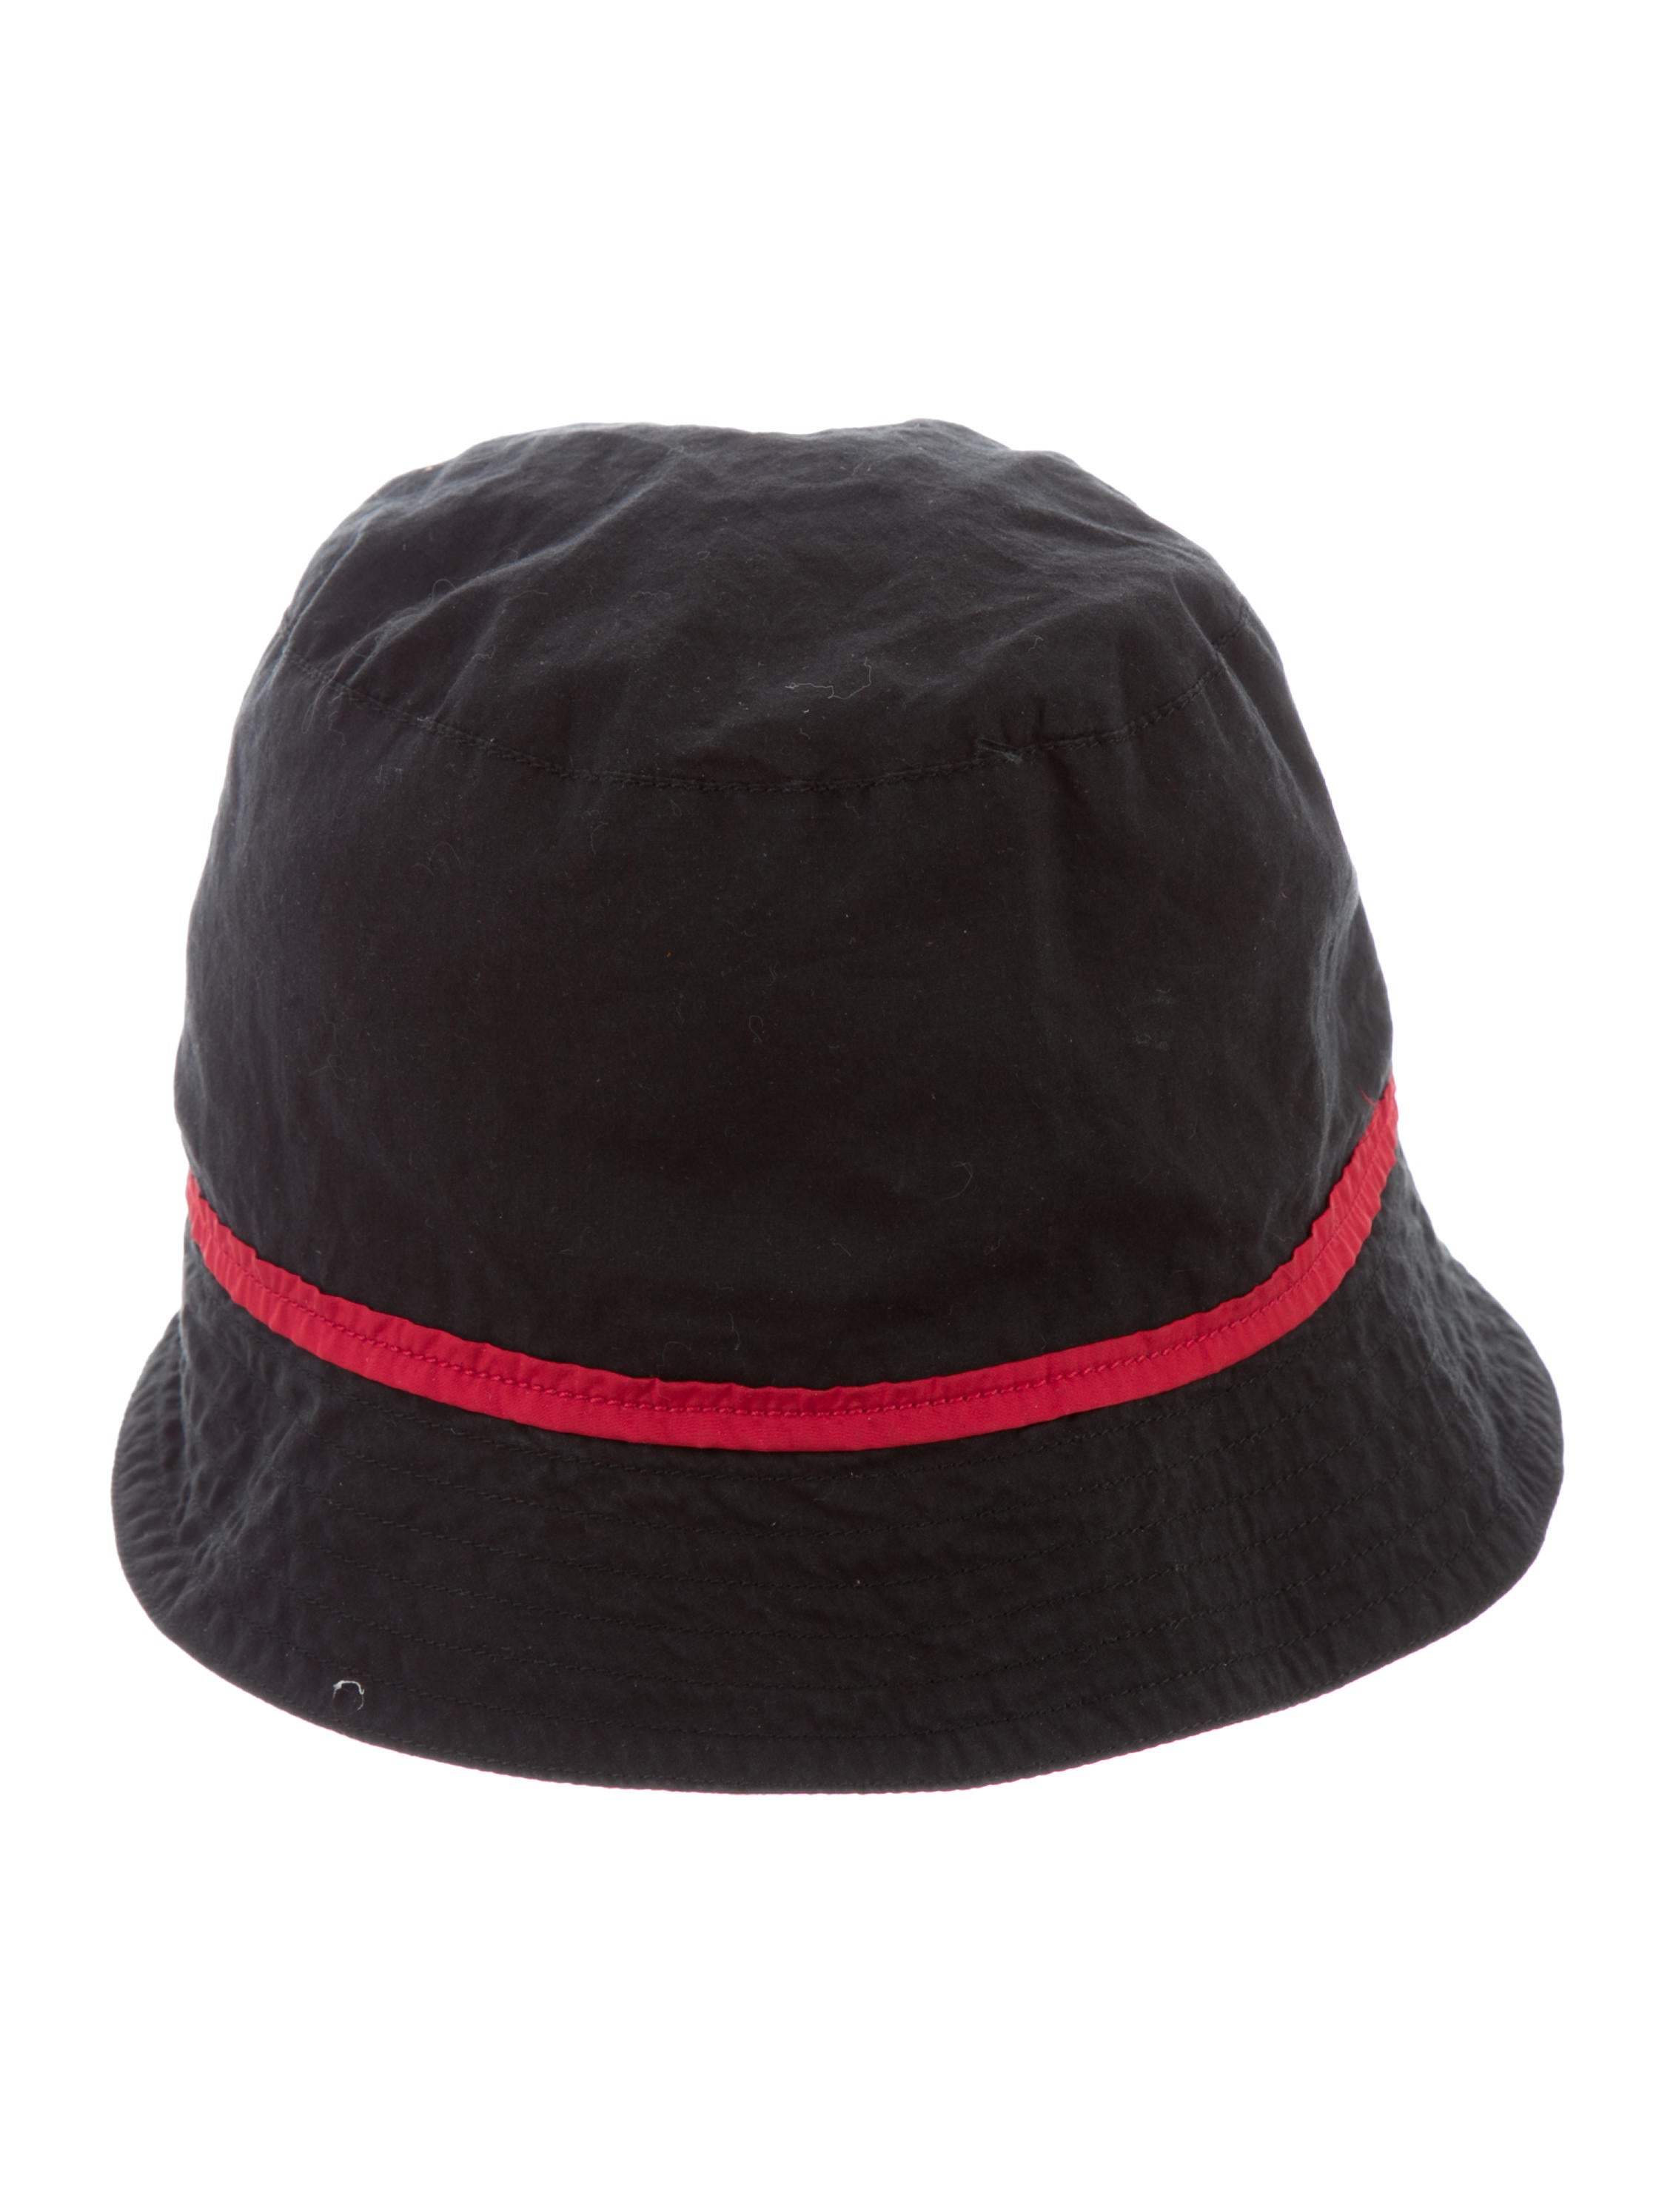 prada sport black bucket hat accessories wpr39535